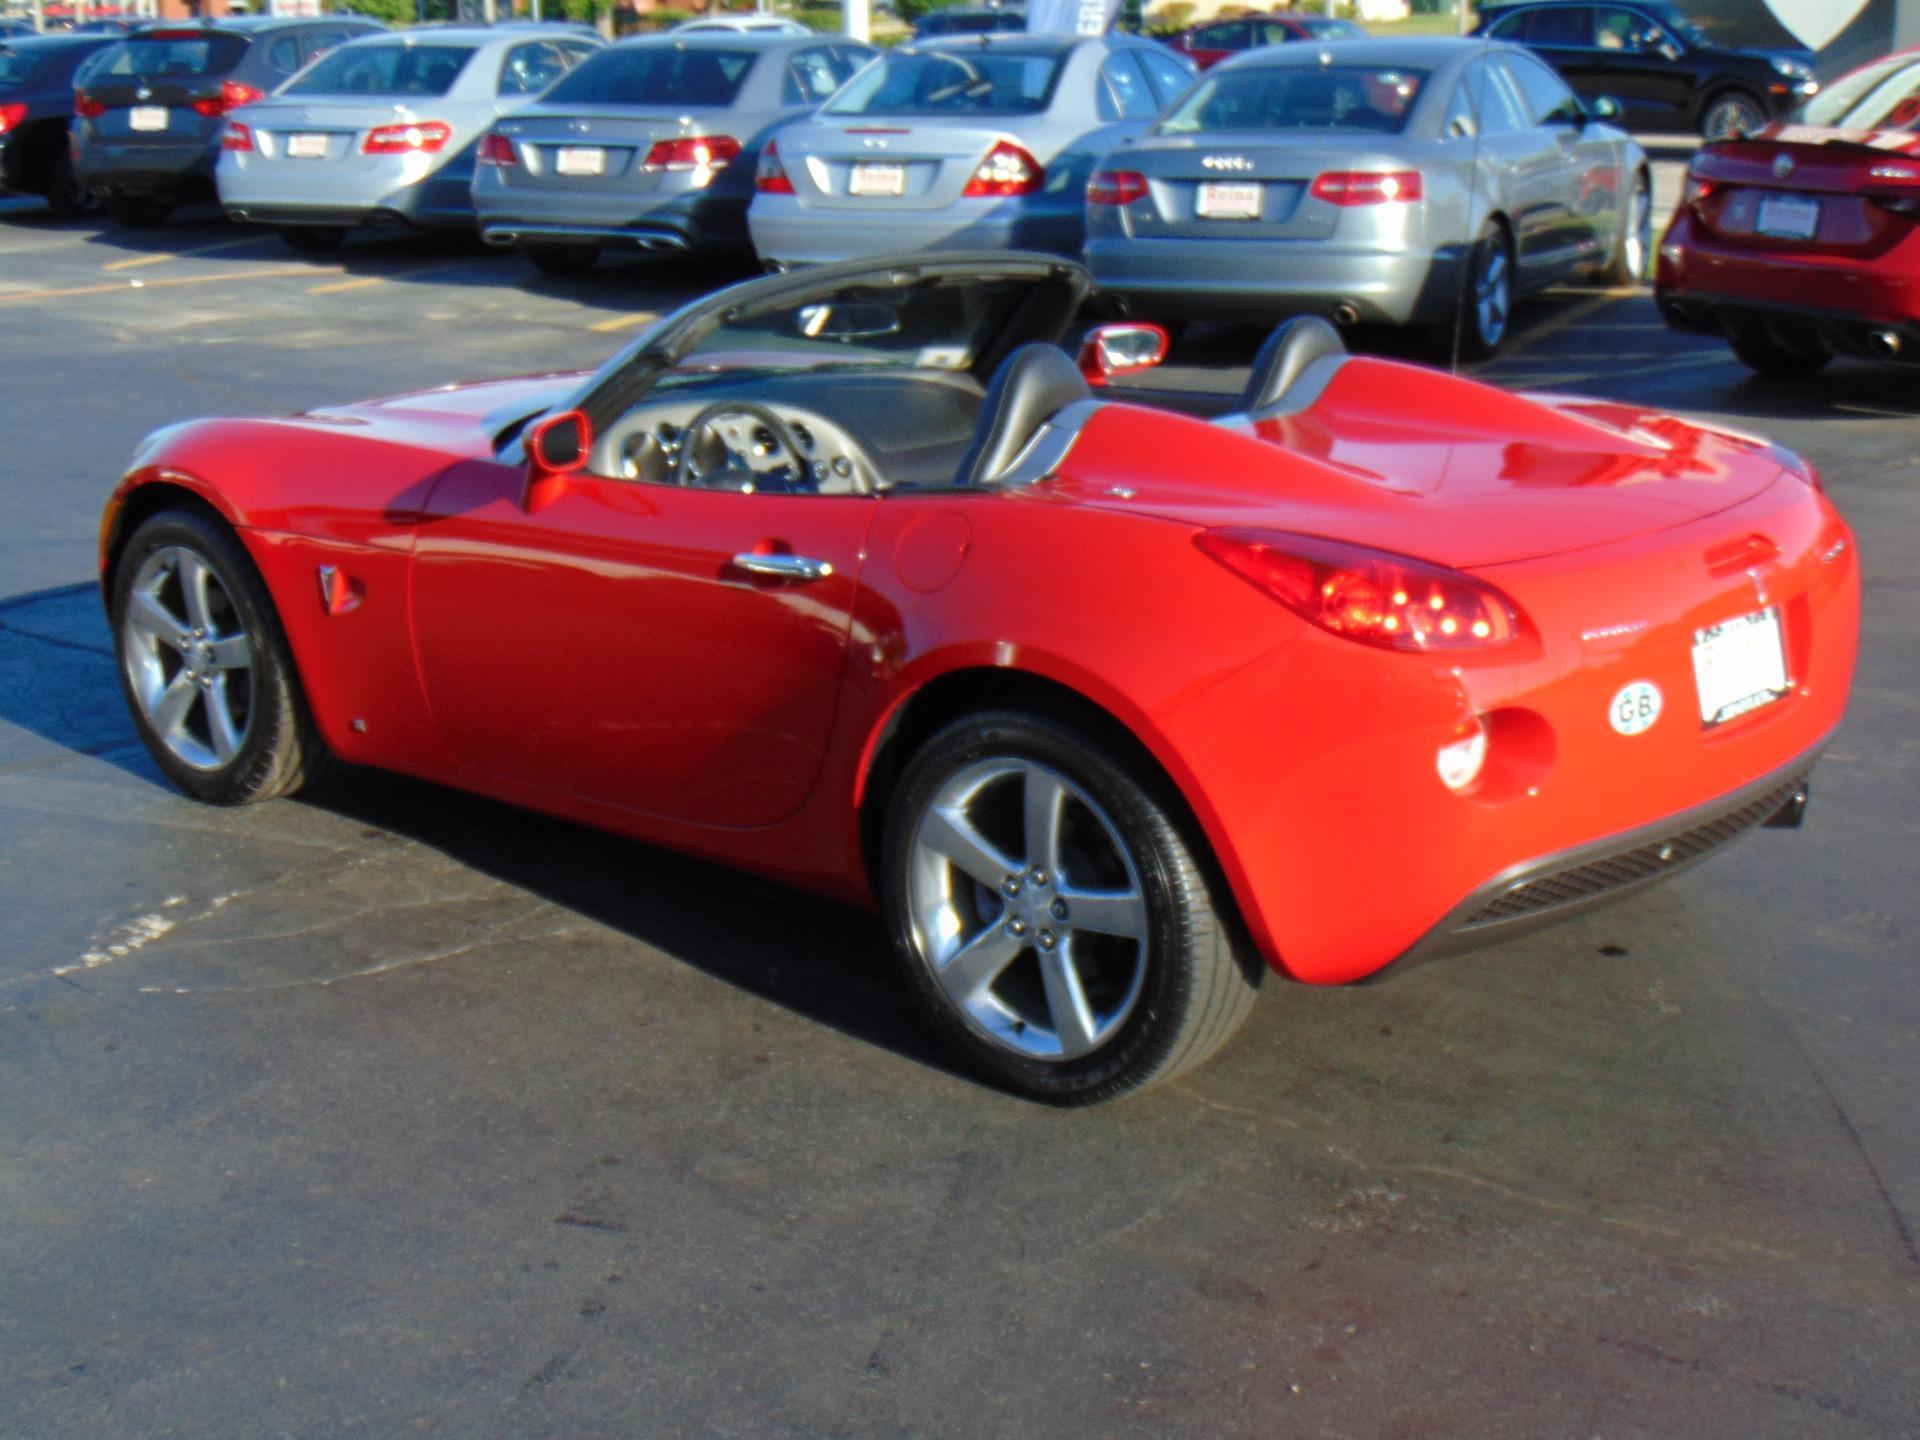 Used-2007-Pontiac-Solstice